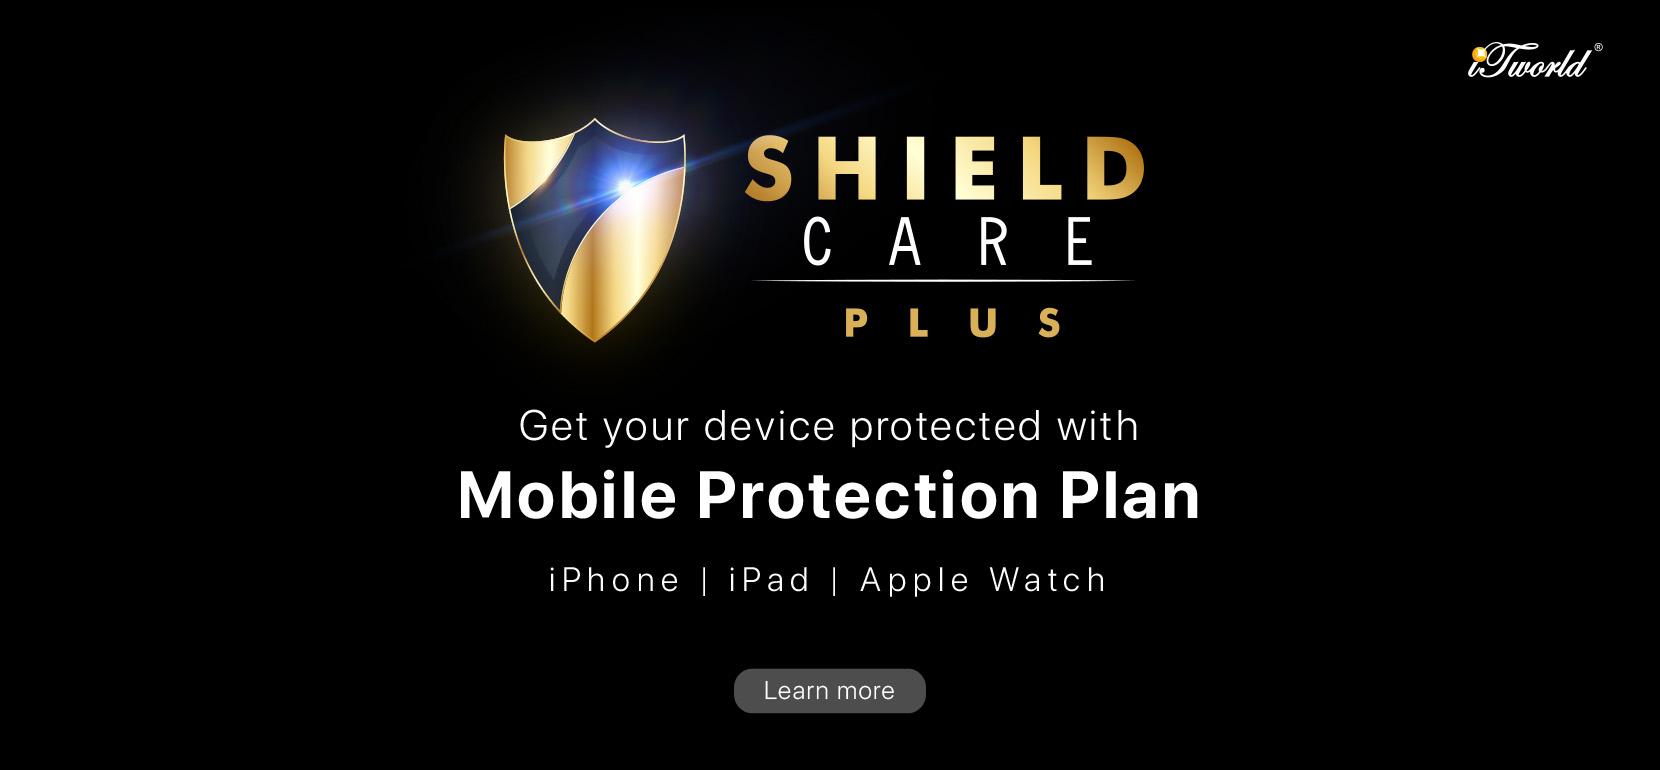 Shieldcare